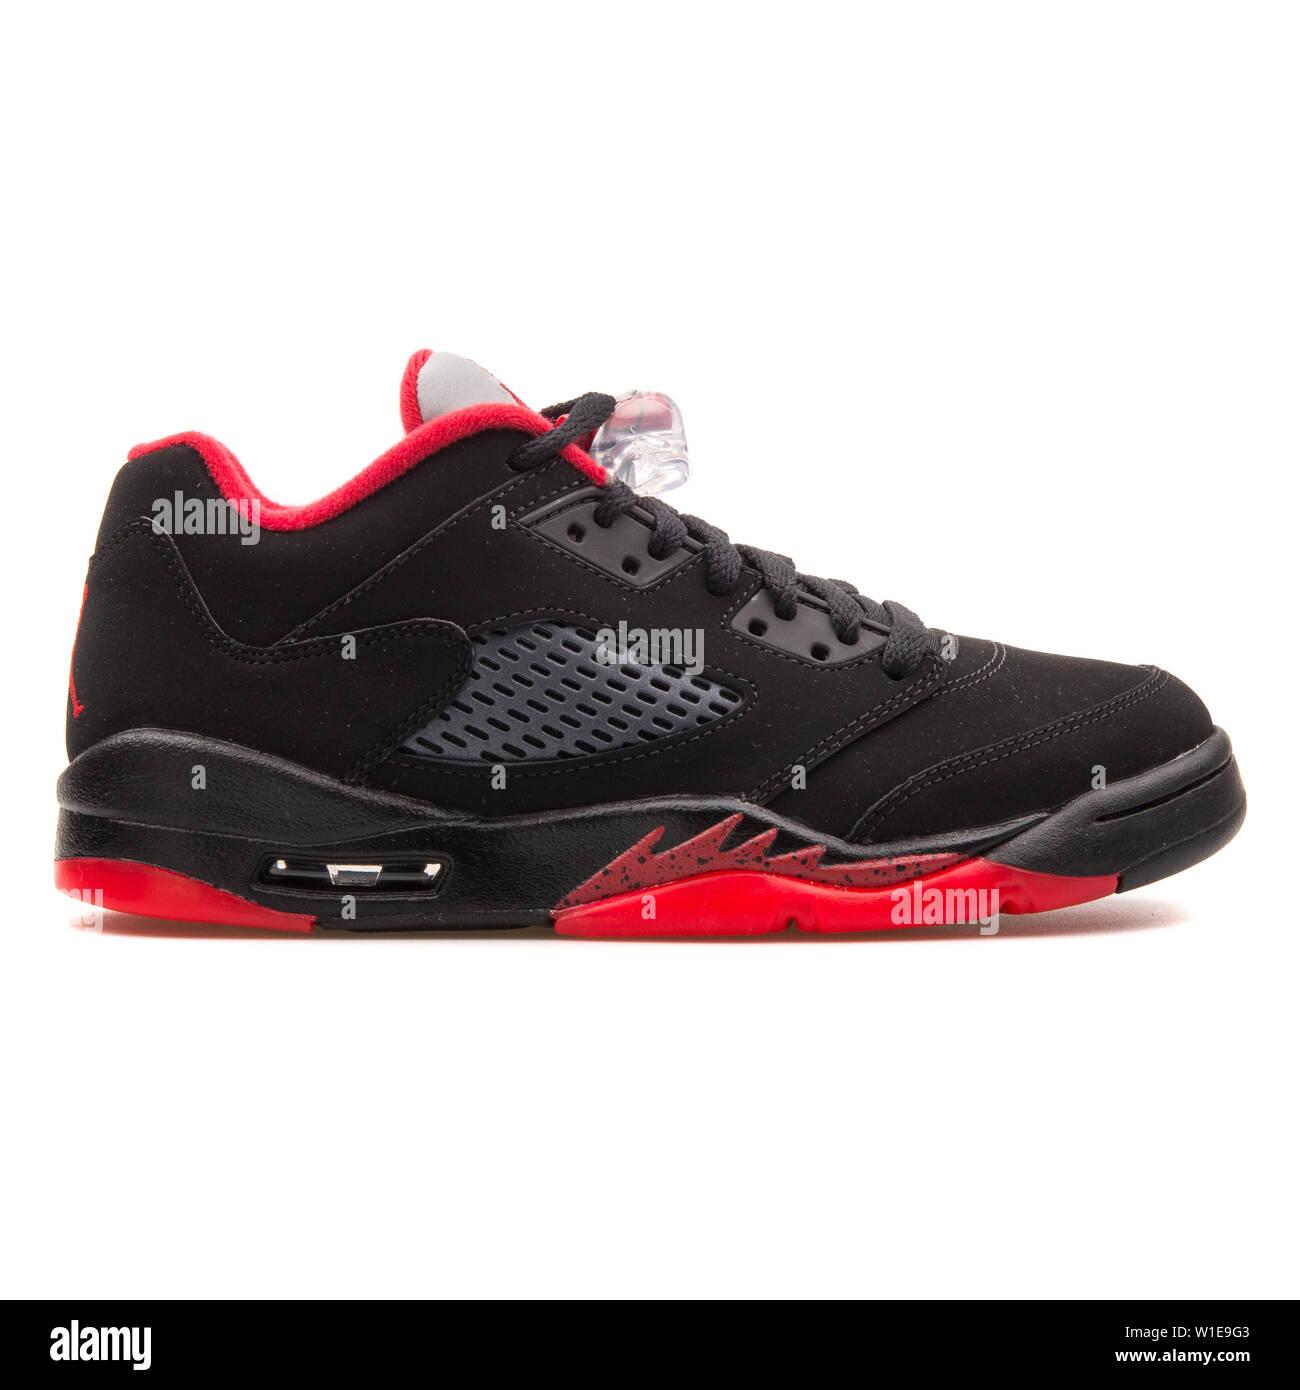 13e50baf Black Red Jordan Sneakers Stock Photos & Black Red Jordan Sneakers ...